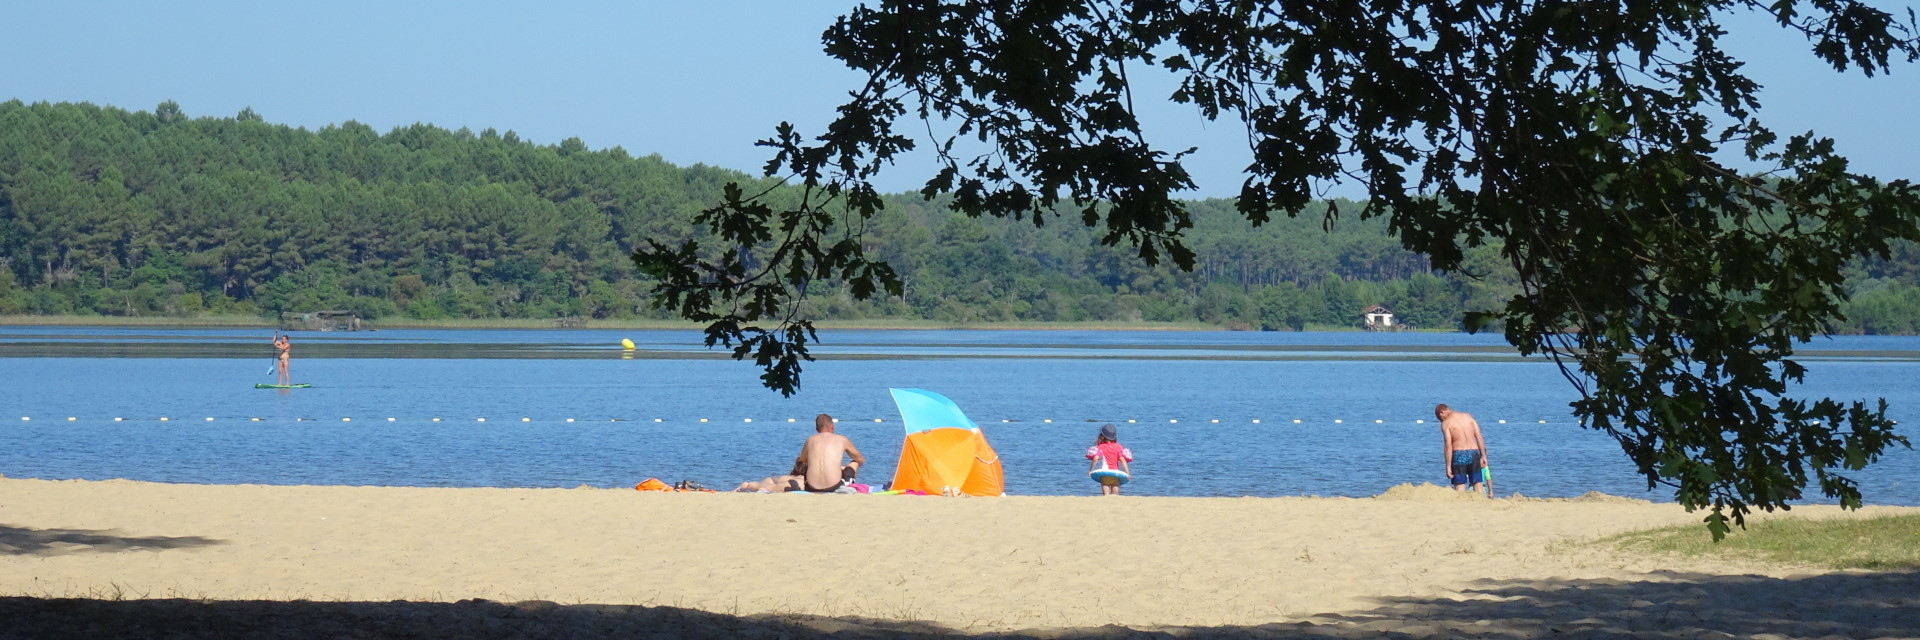 Info covid 19 camping du lac camping 3 toiles pr s du - Camping dordogne avec piscine et lac ...